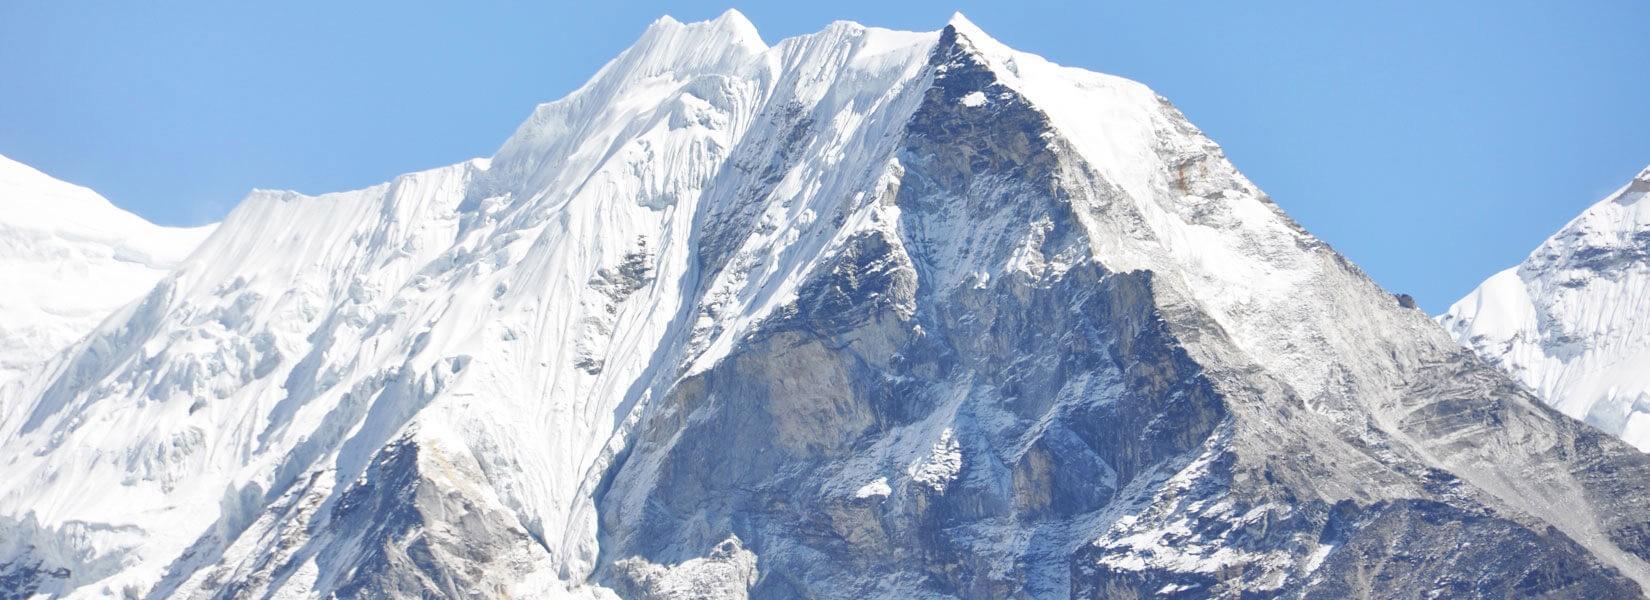 Island Peak Climbing Photo